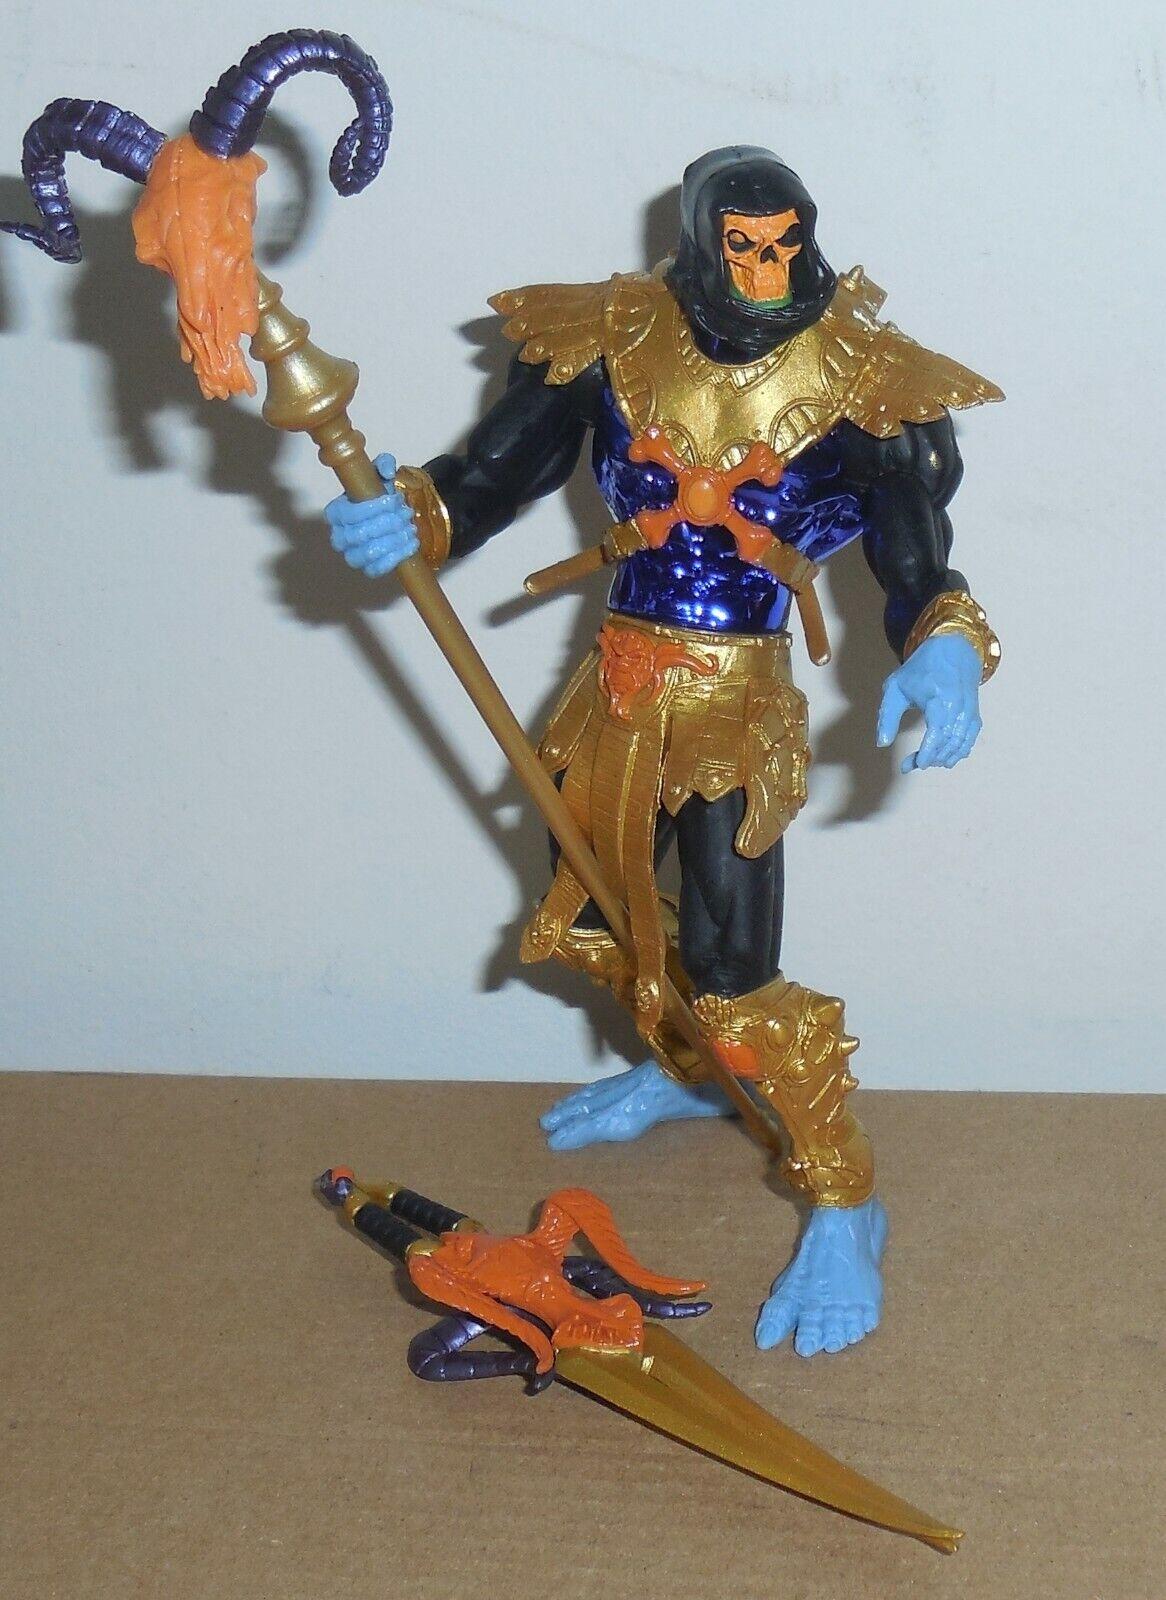 Motu Gold Discoteca Skeletor Completo 2002 200x Masters Of The Universe He-Man